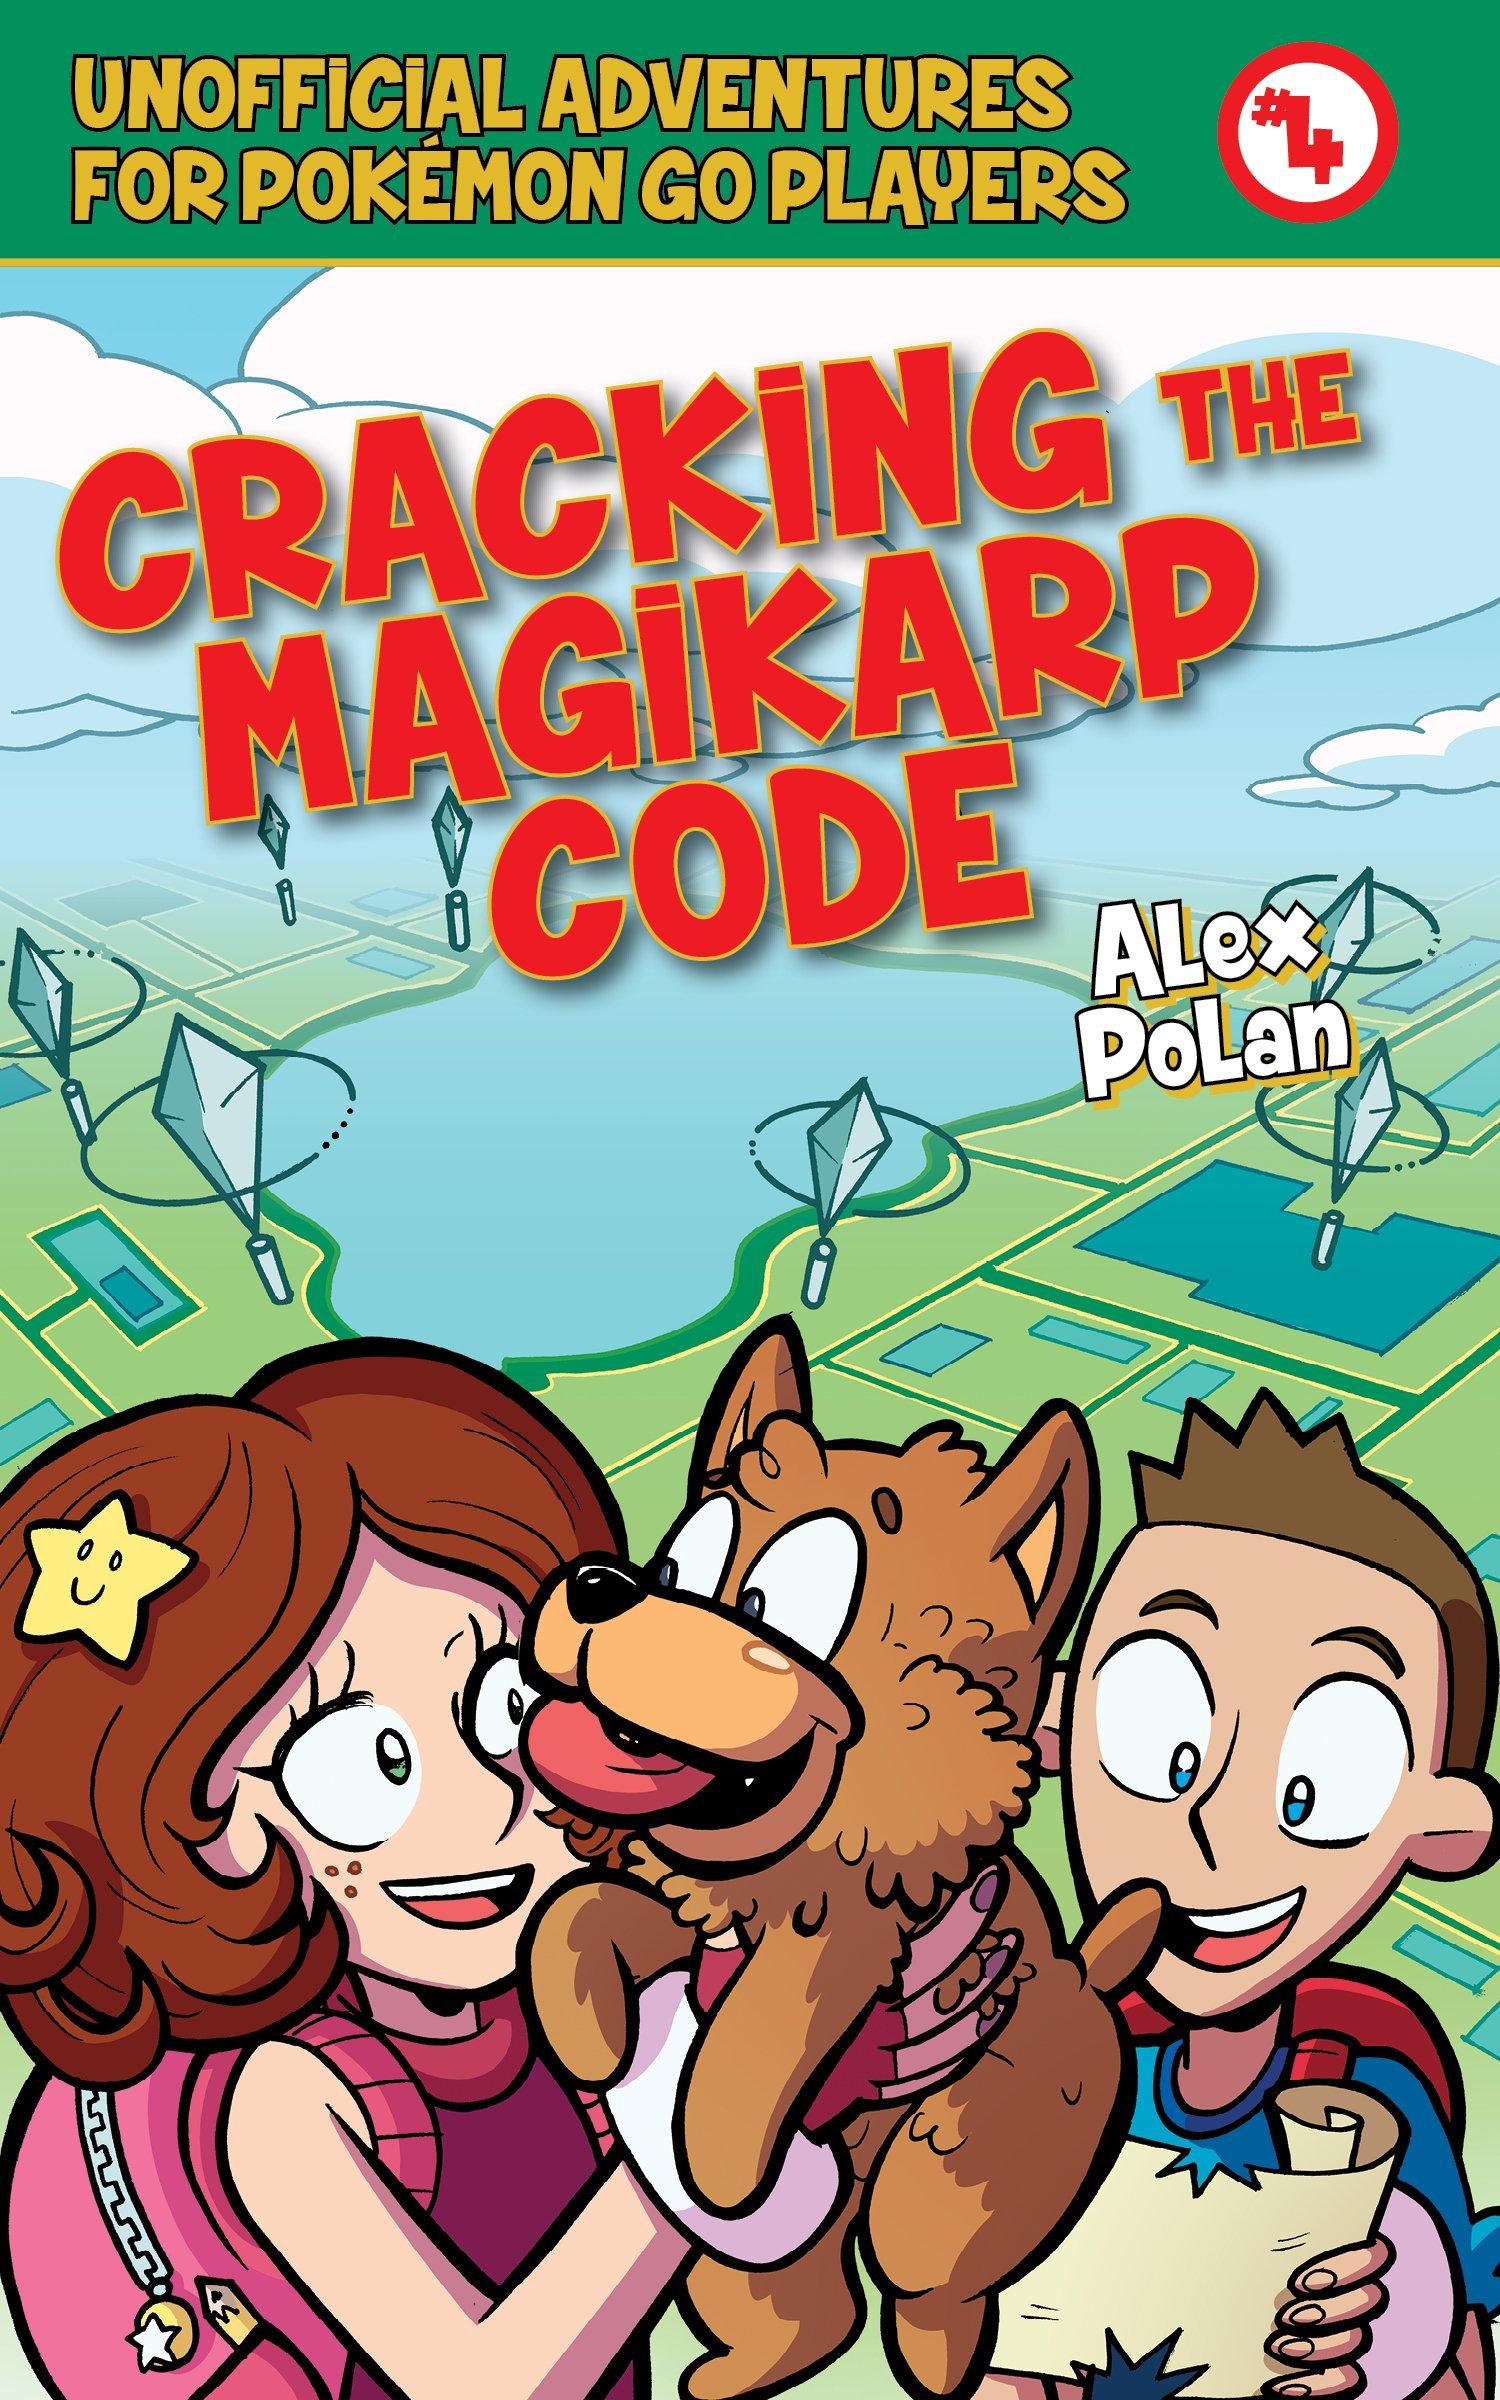 Cracking the Magikarp Code: Unofficial Adventures for Pokémon GO Players, Book Four pdf